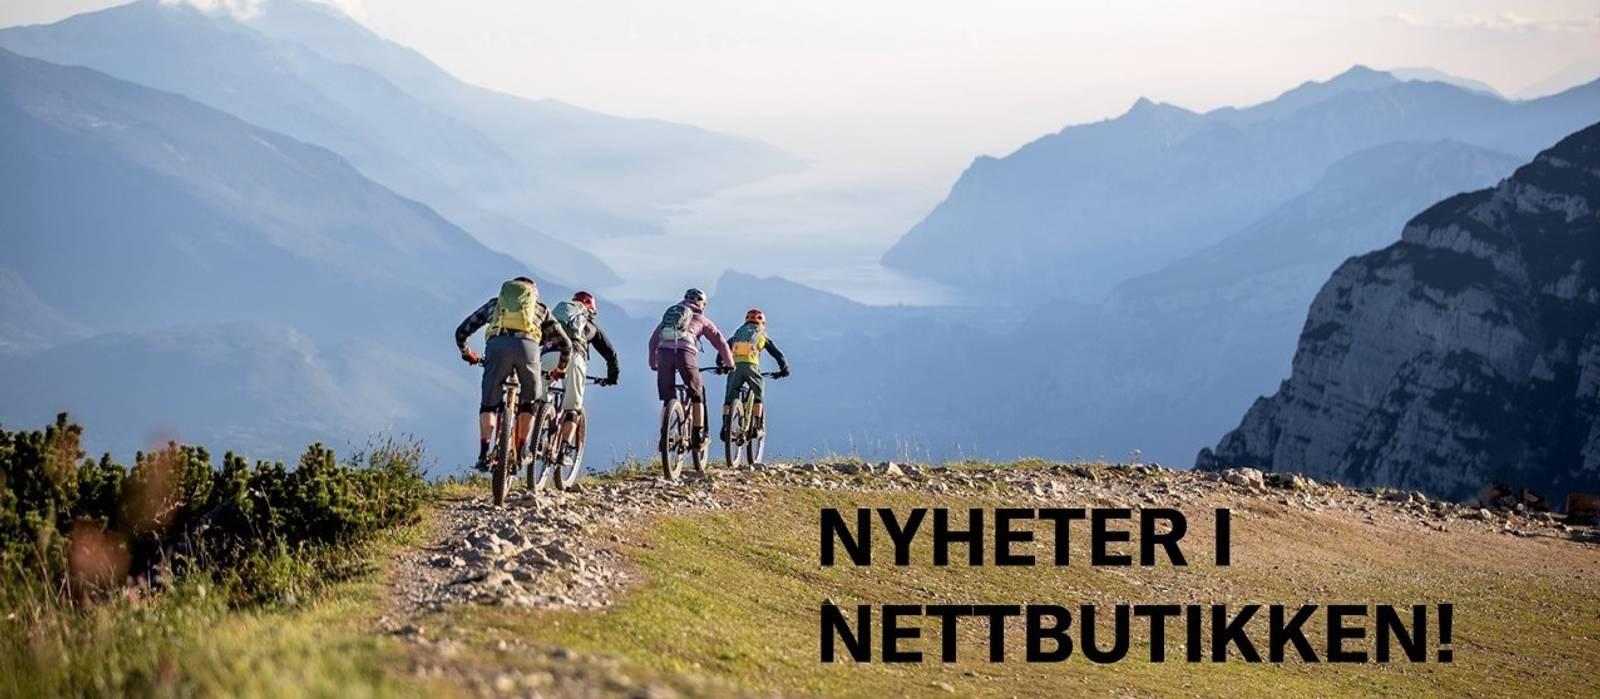 Deuter Trans Alpine sykkelsekk enduro